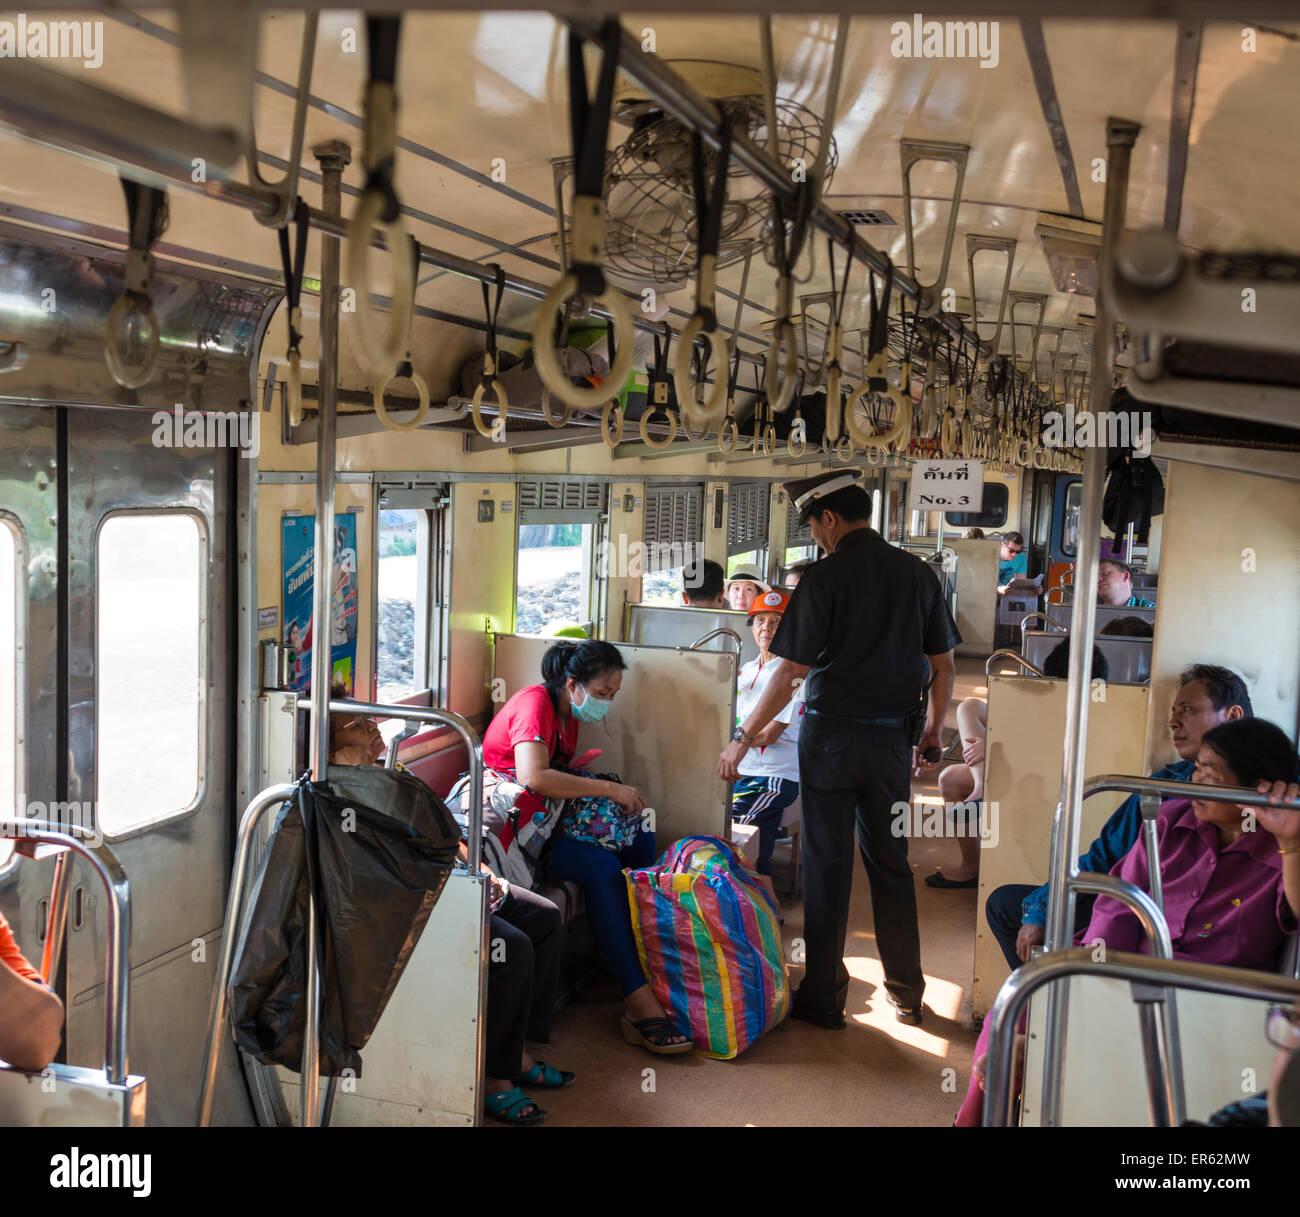 Kontrolleur in einem Regionalzug, Thailand Stockbild